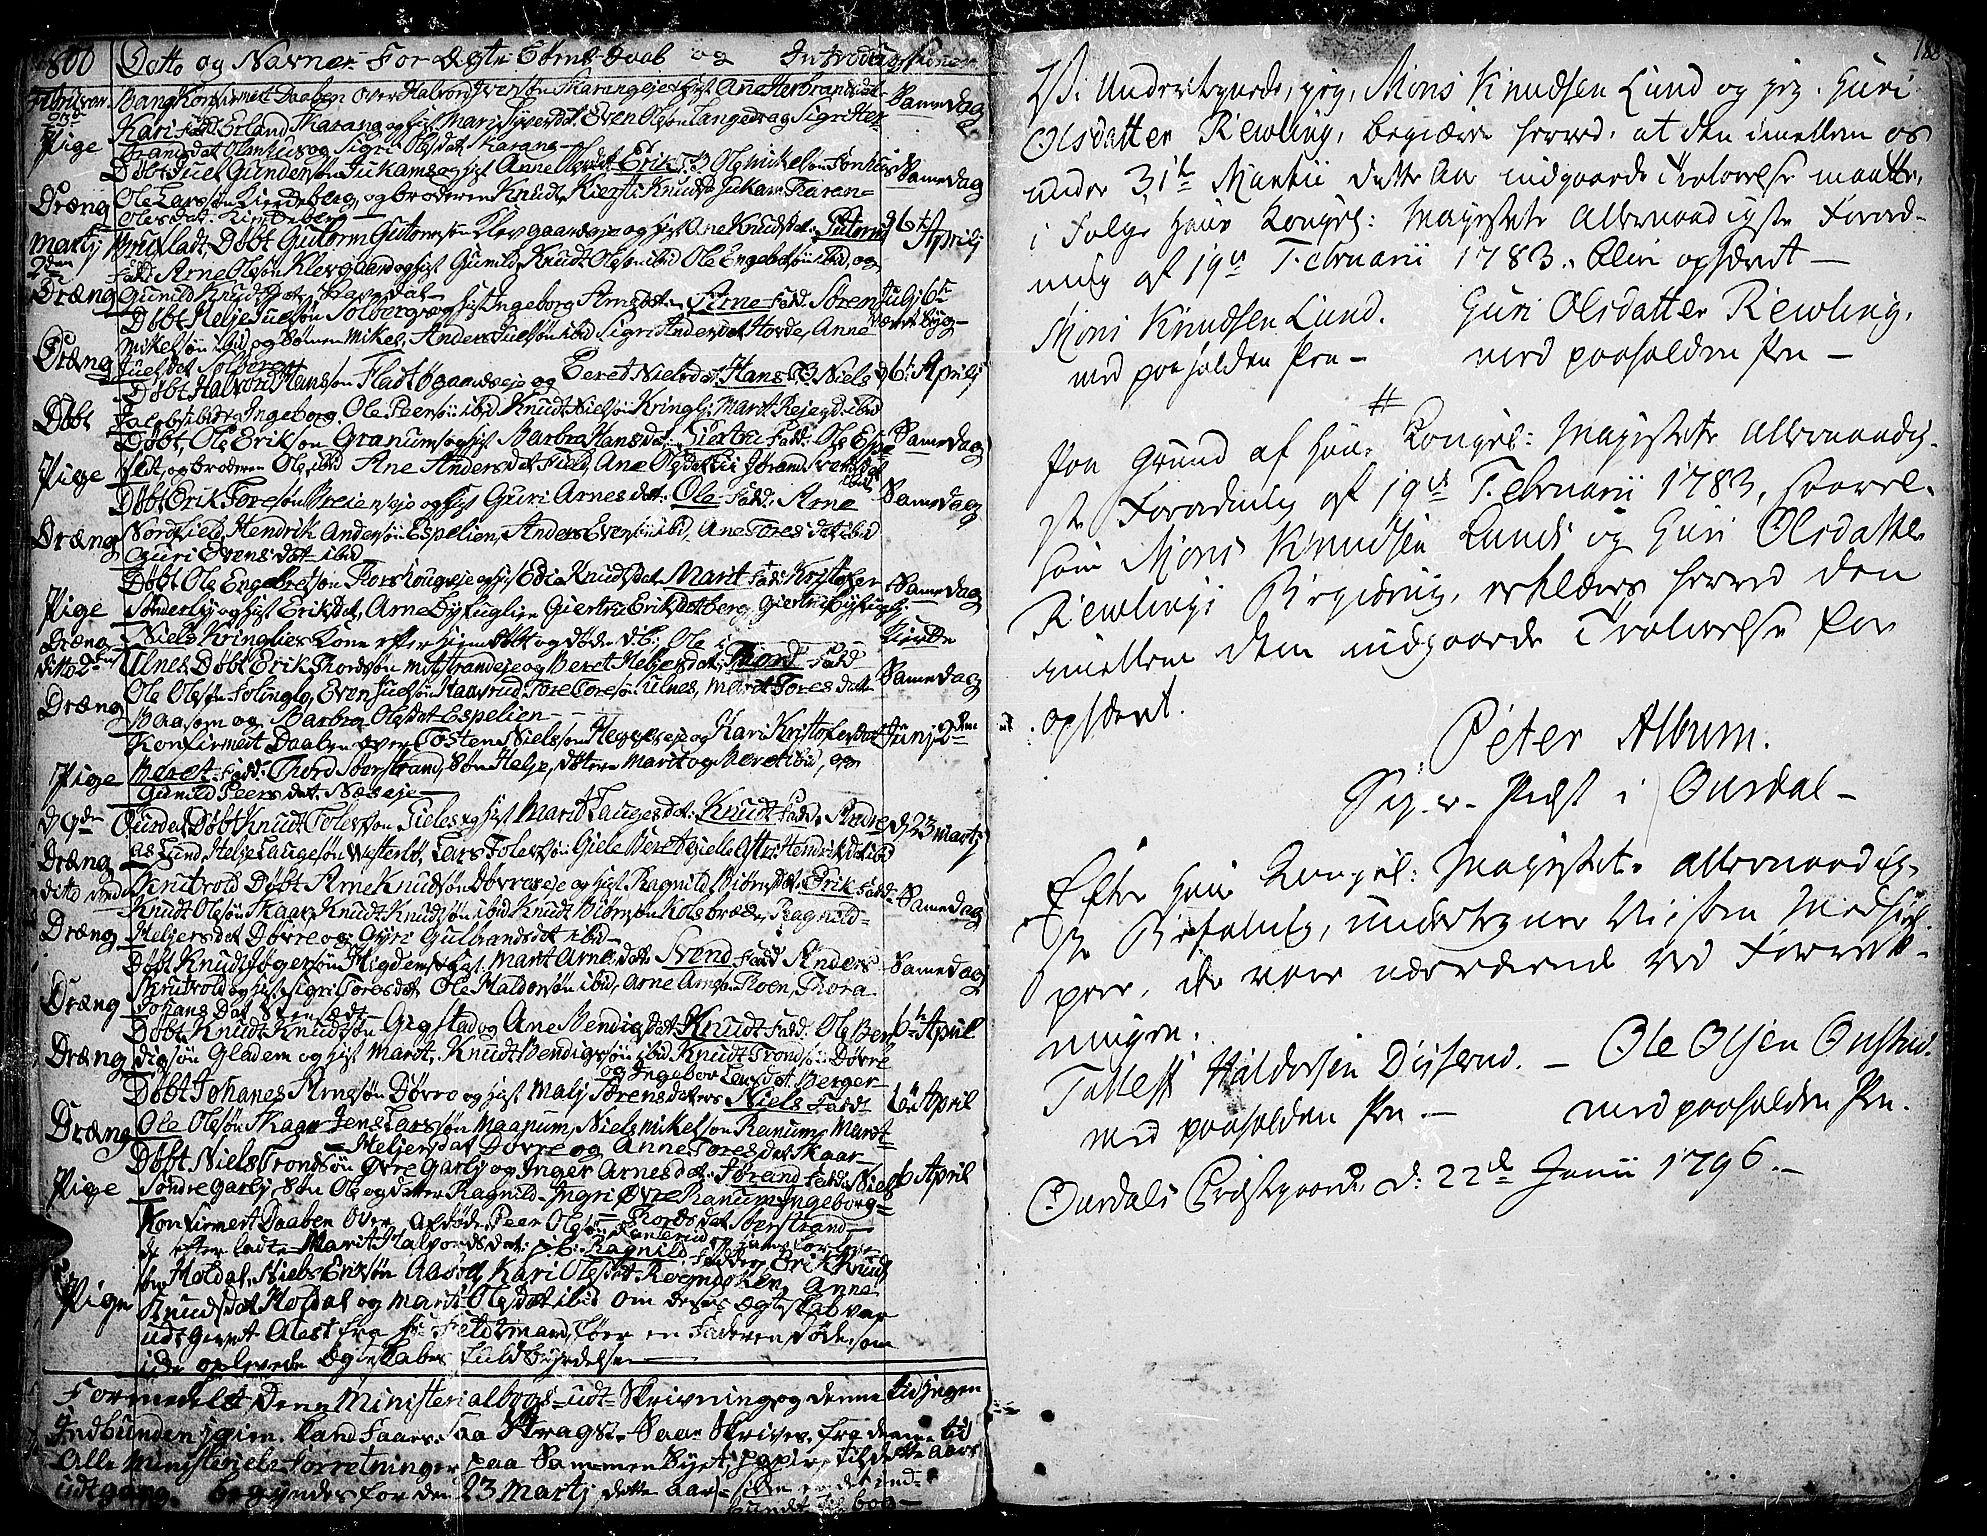 SAH, Aurdal prestekontor, Ministerialbok nr. 6, 1781-1804, s. 188